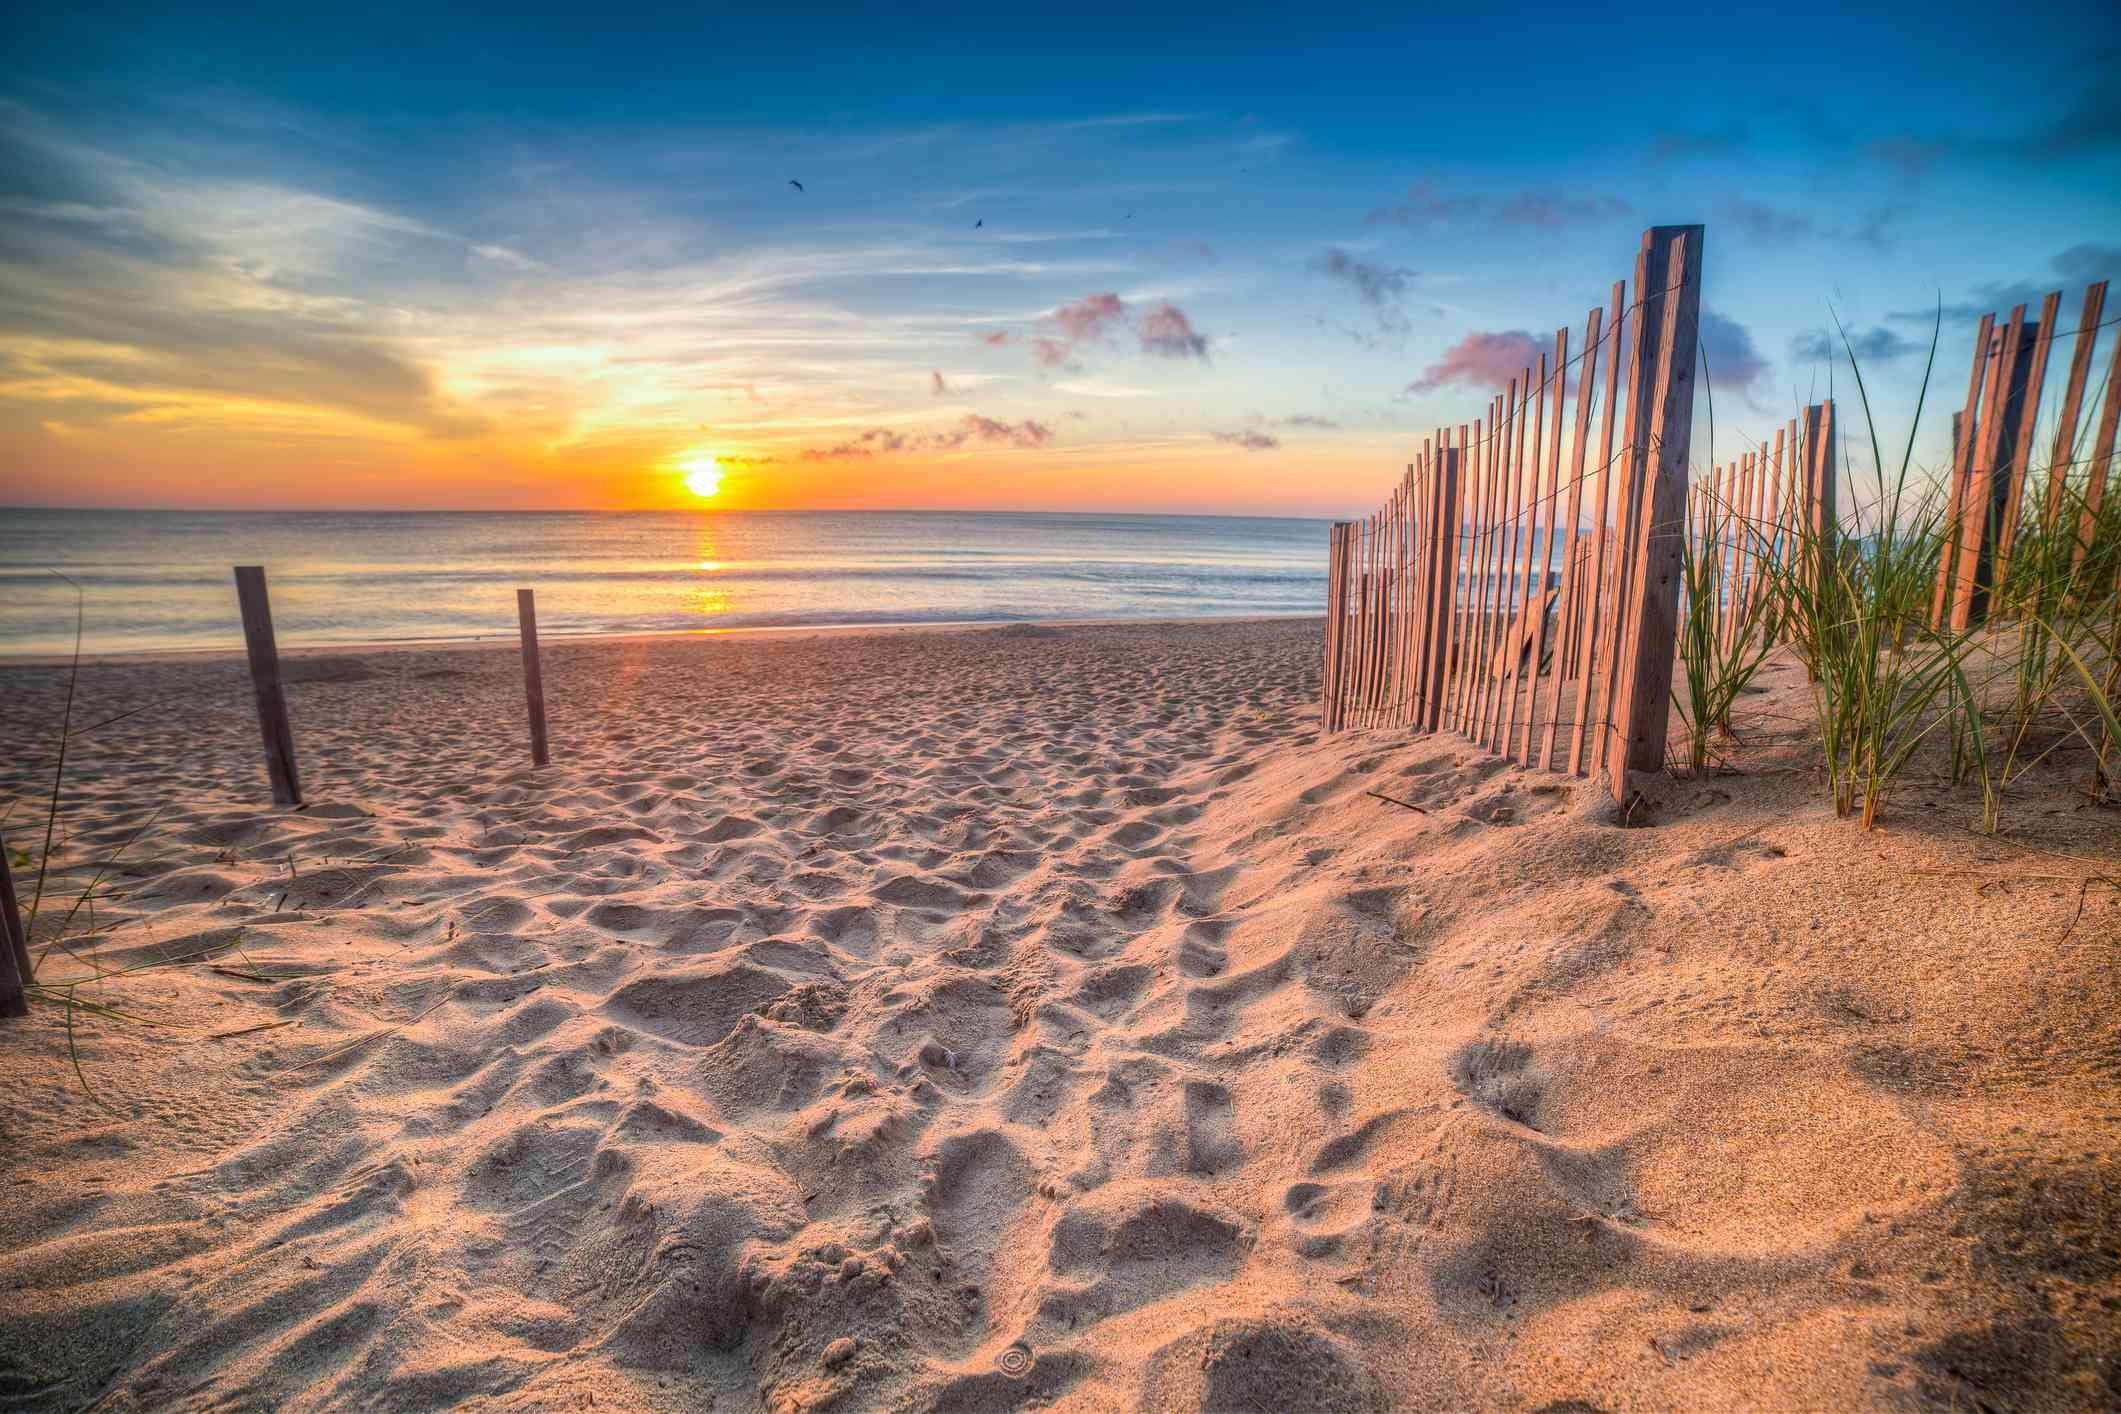 Sandy beach and Atlantic Ocean at sunrise, Outer Banks, North Carolina, USA